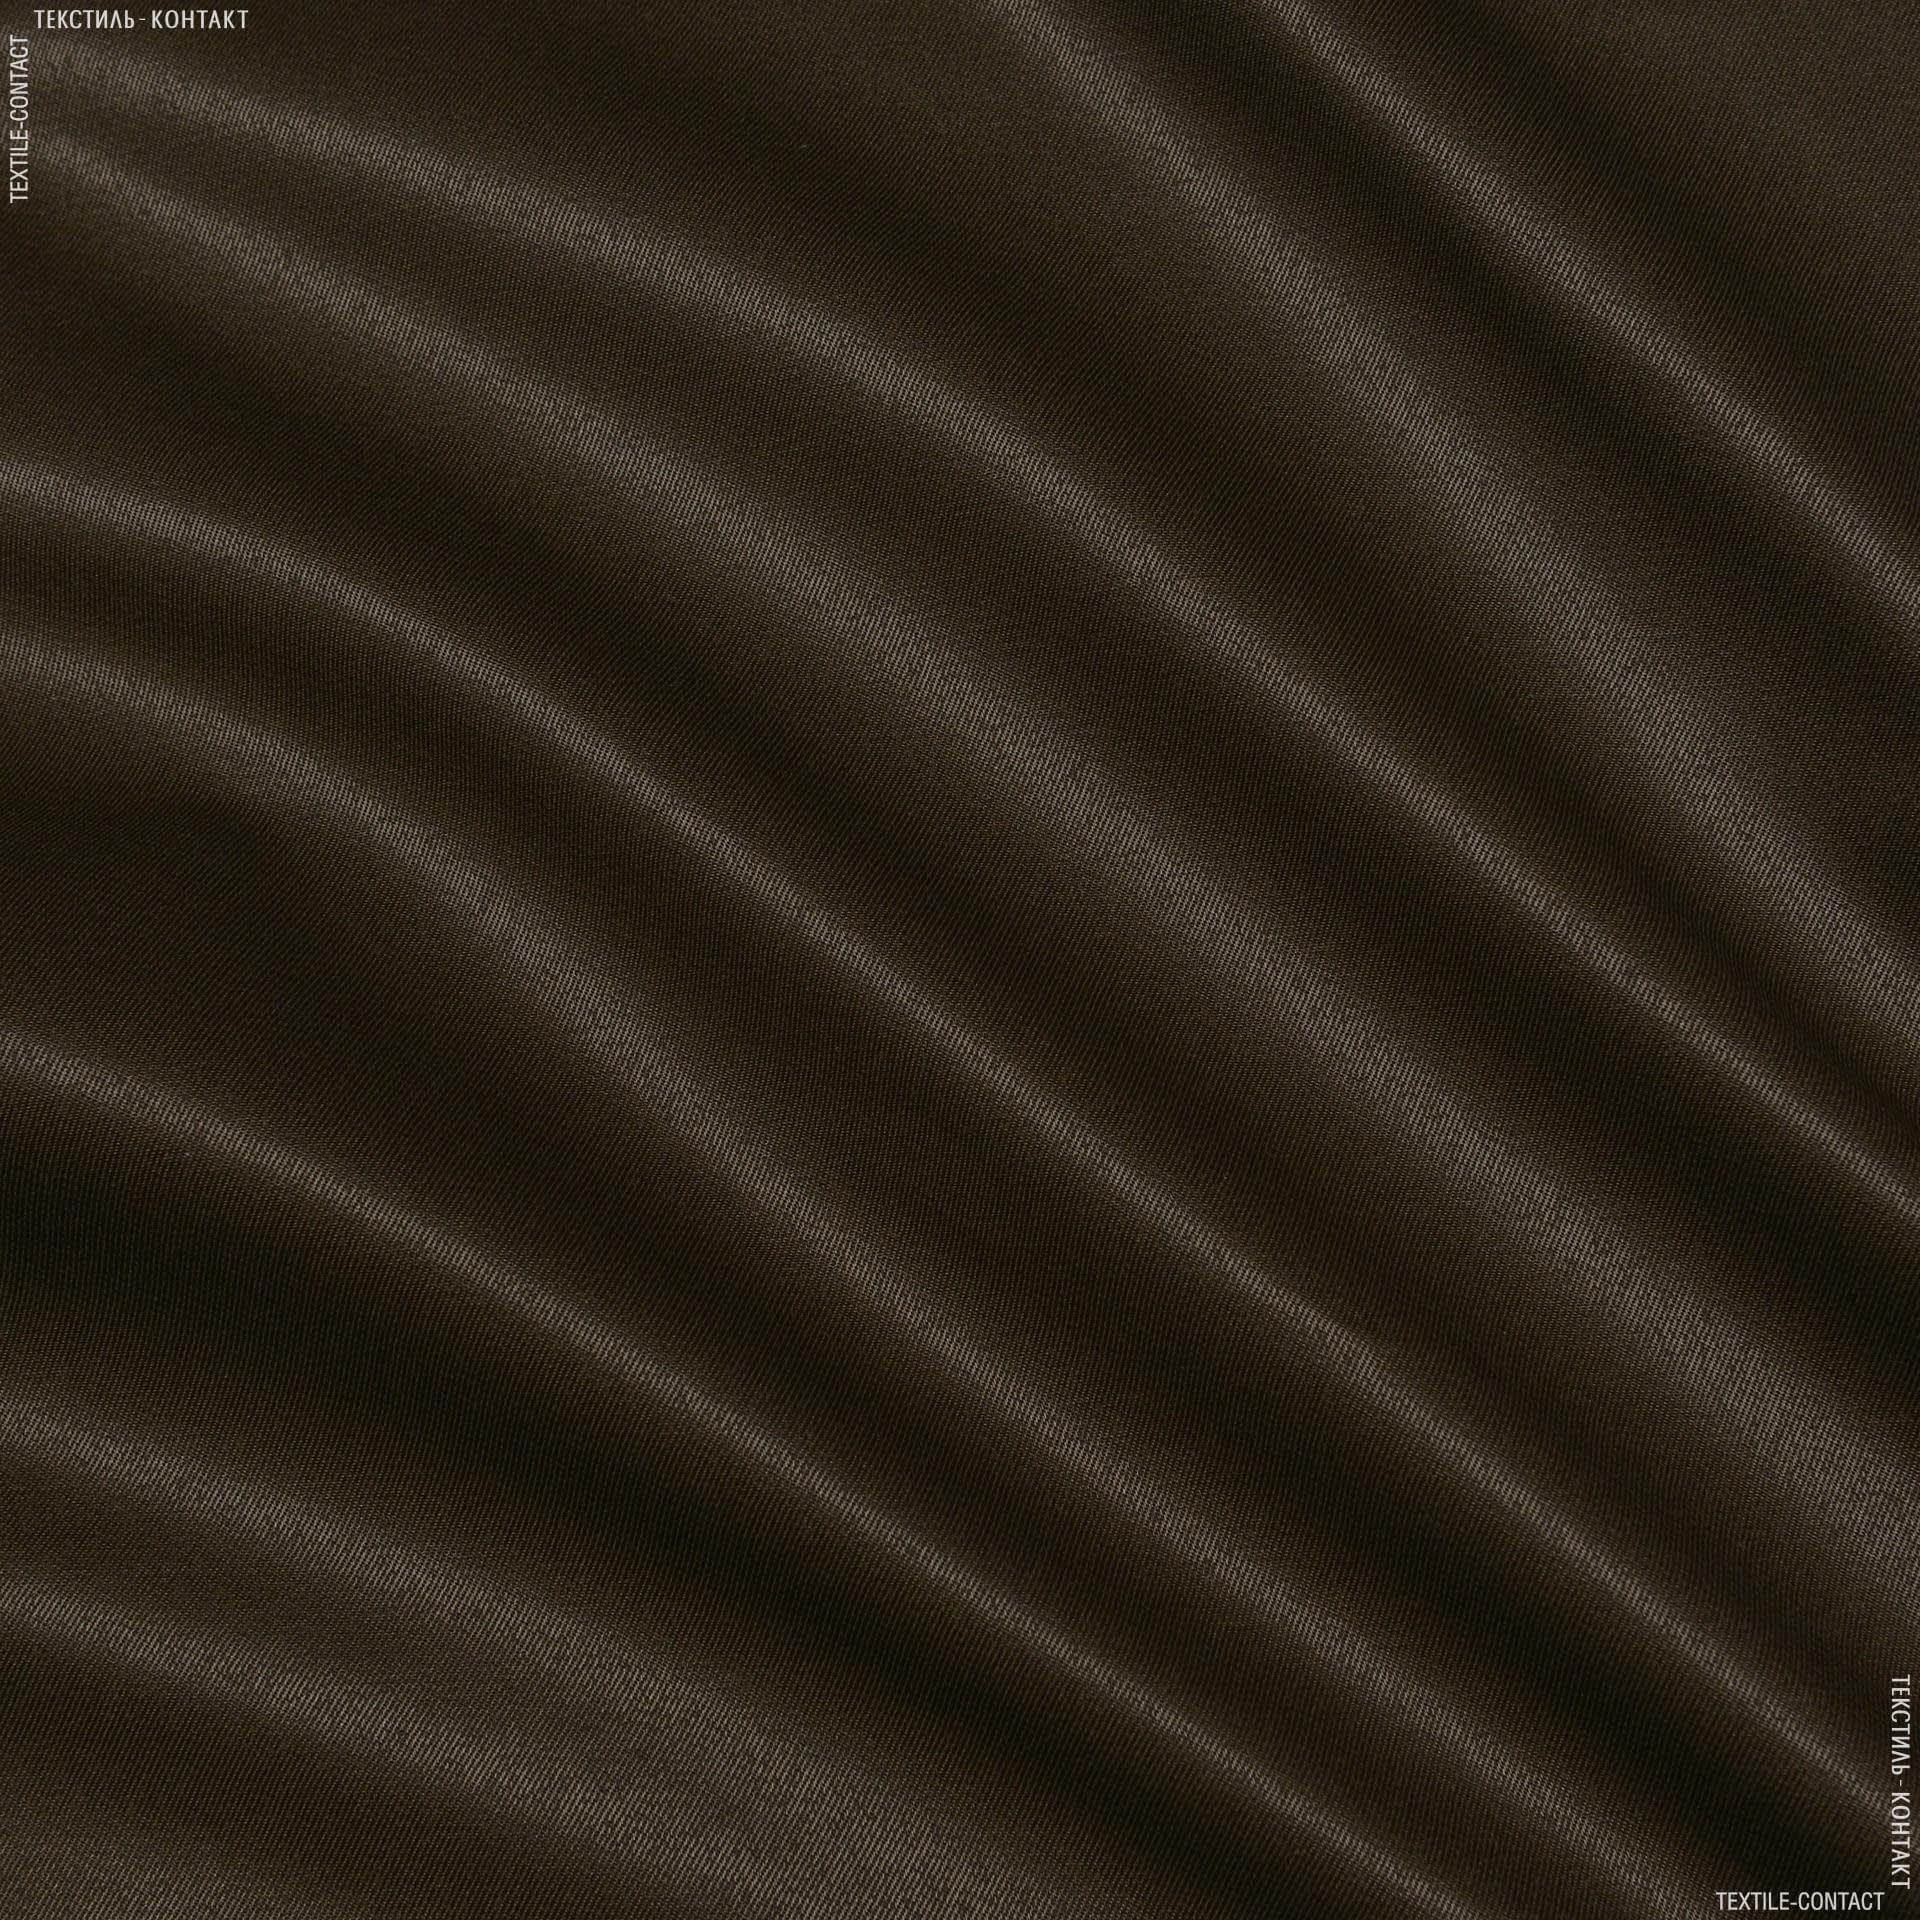 Тканини для спецодягу - Грета-2811 коричневий